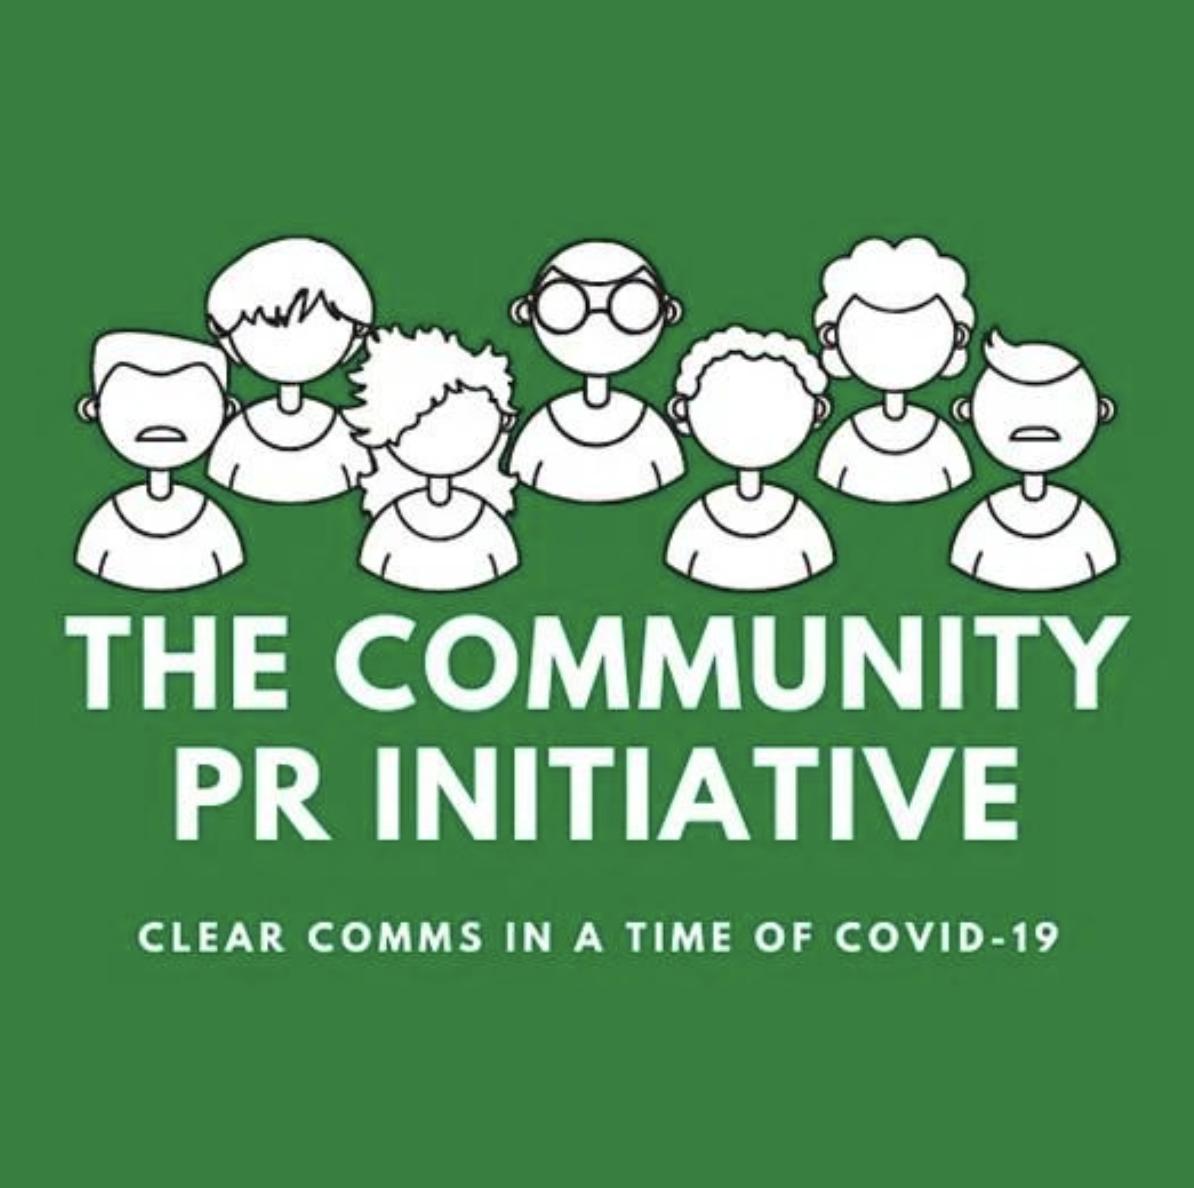 The Community PR Initiative